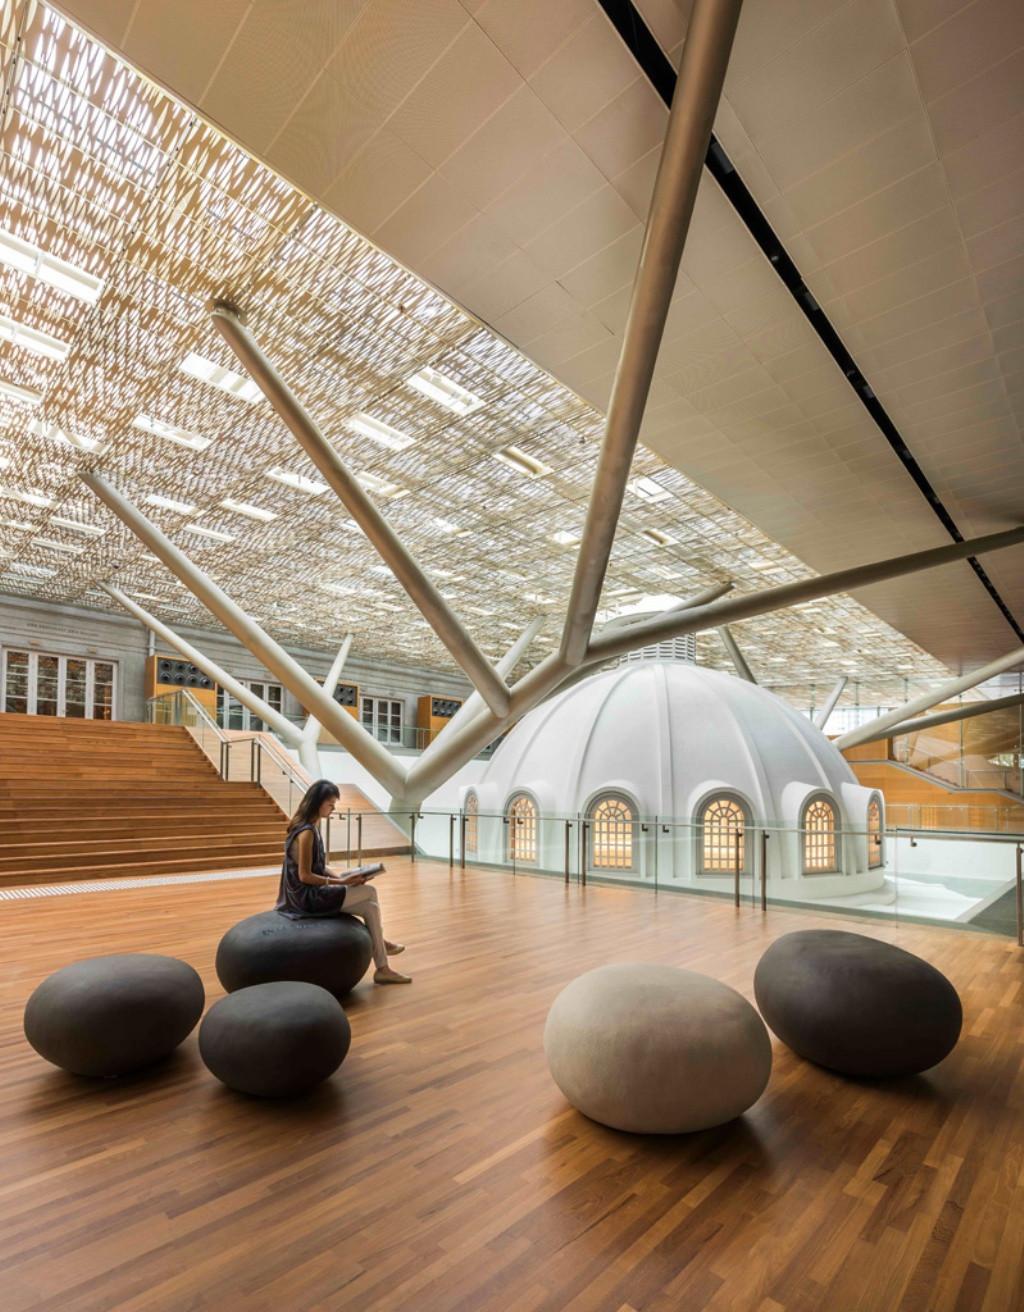 prestige hardwood flooring bend oregon of atelier vierkant within national gallery singapore